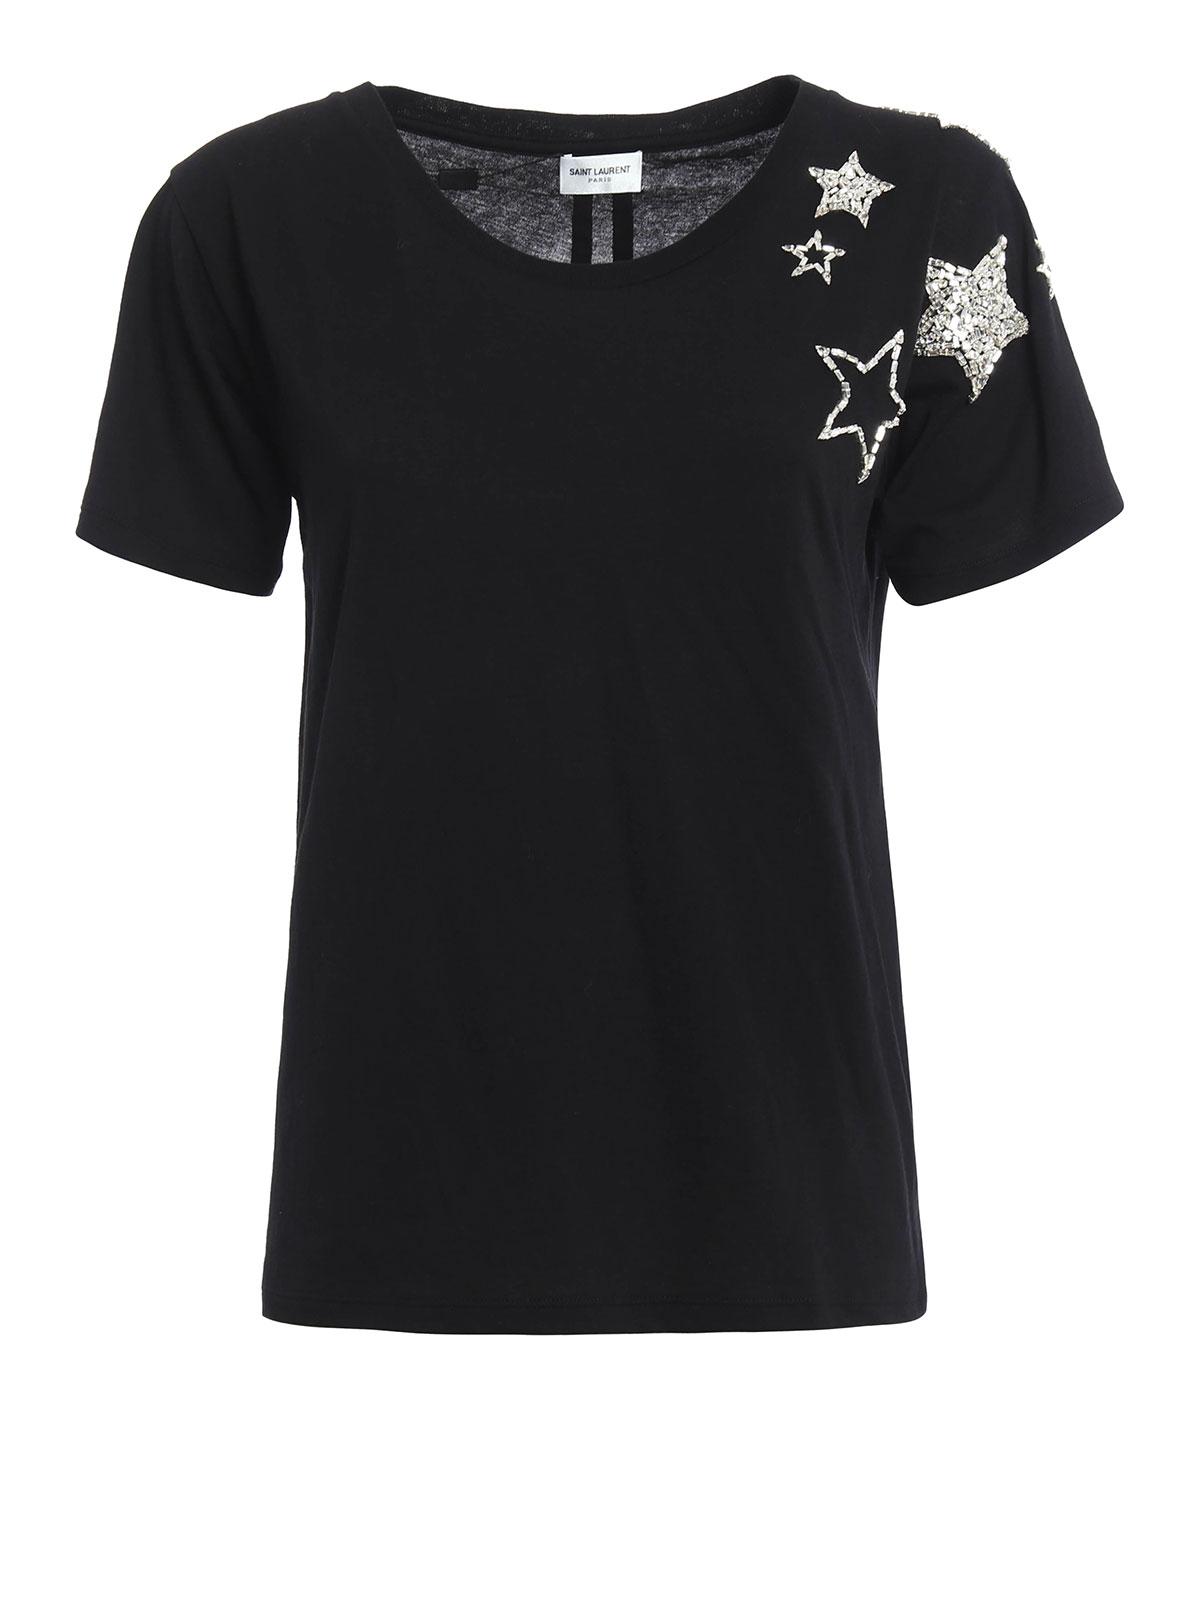 Rhinestone stars detailed t shirt by saint laurent t for Saint laurent t shirt